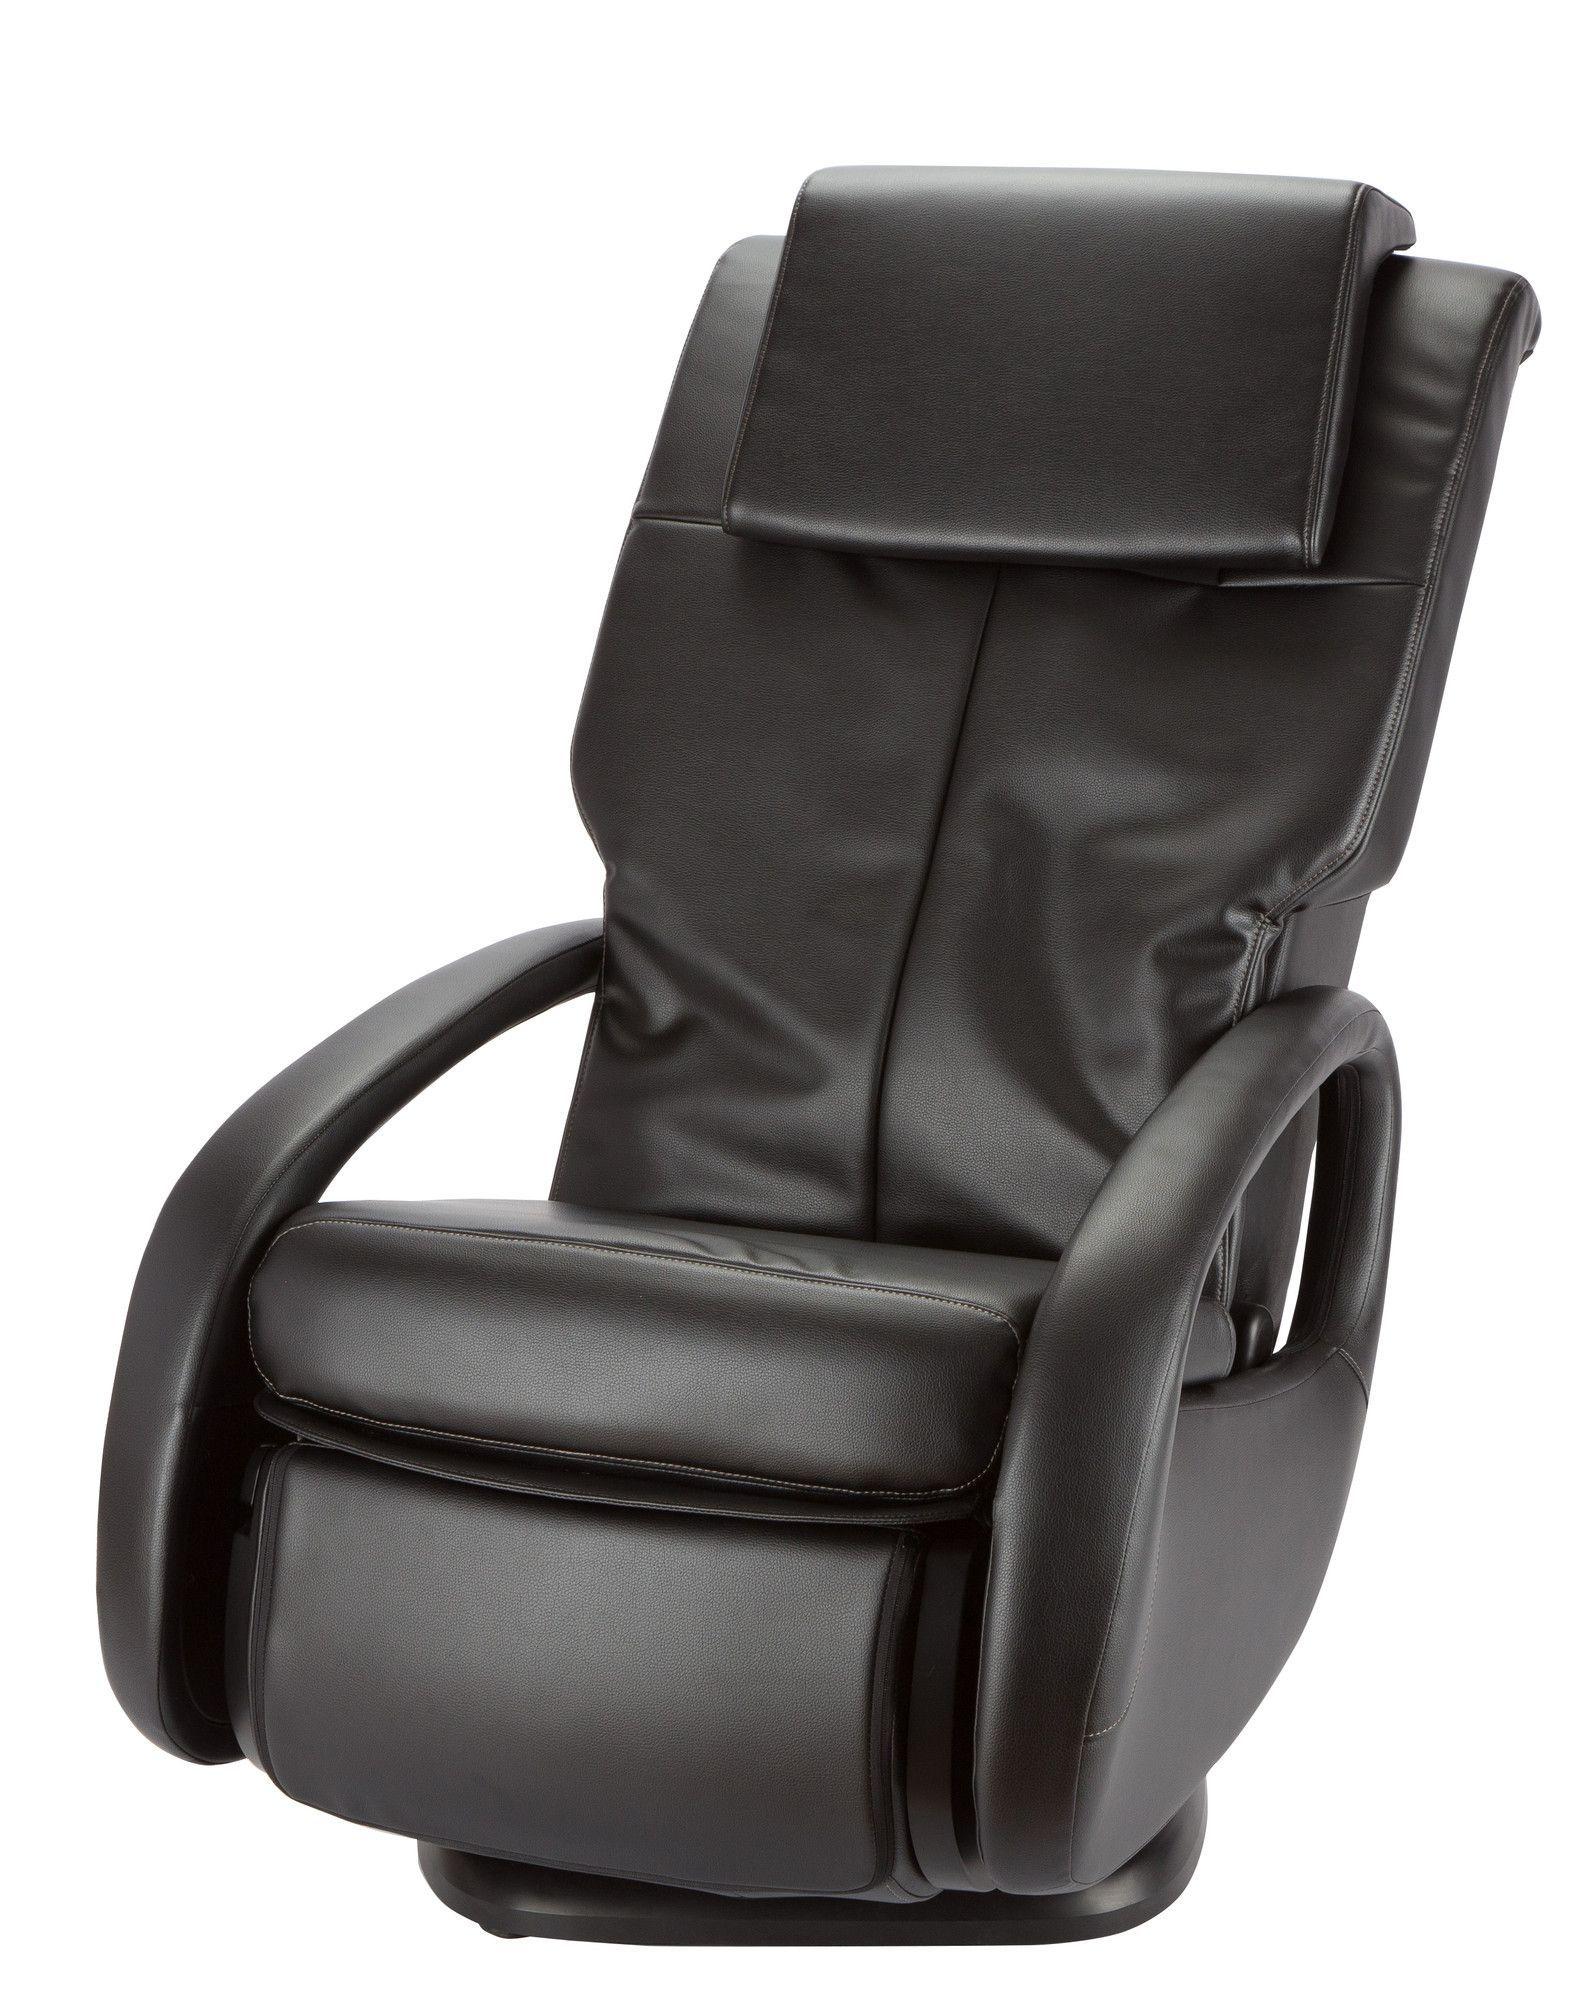 Hd Homedics 3d Ultimate Massage Chair